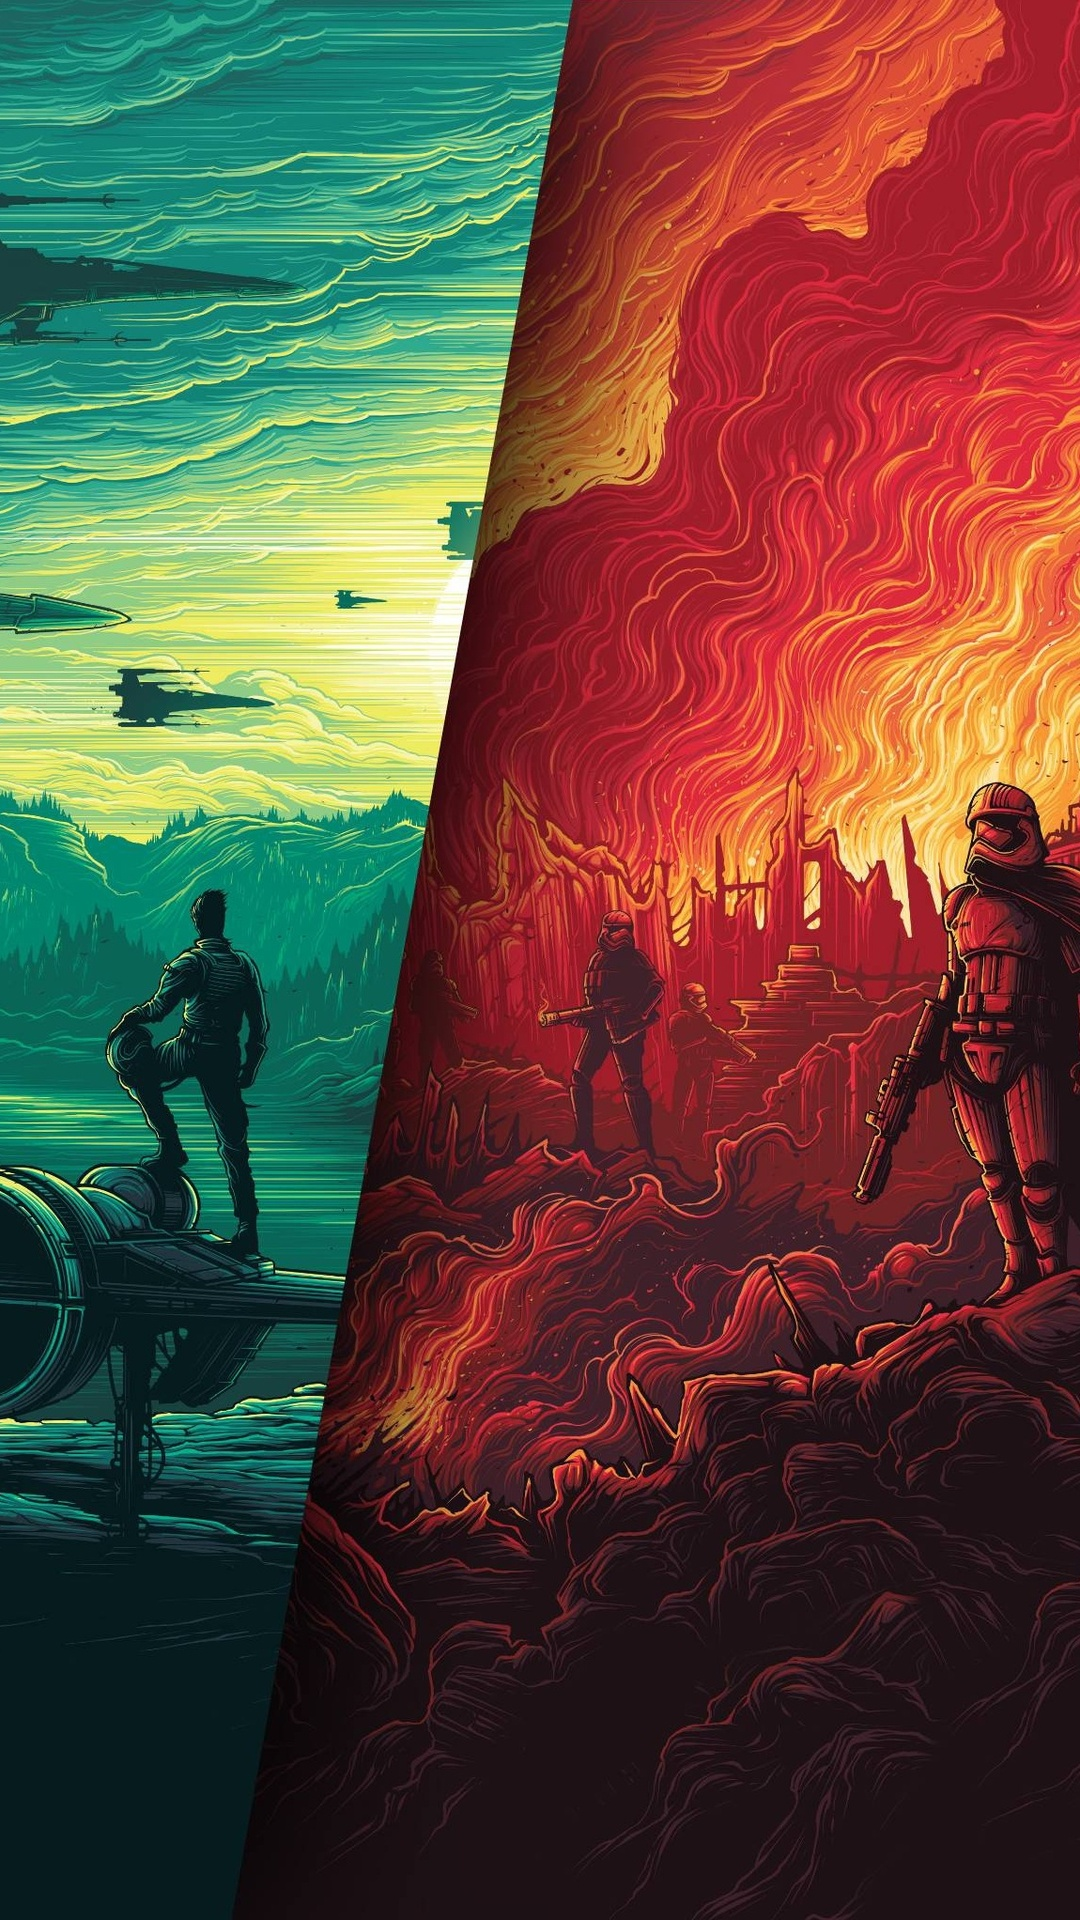 1080x1920 Star Wars Poster 4k Iphone 7,6s,6 Plus, Pixel xl